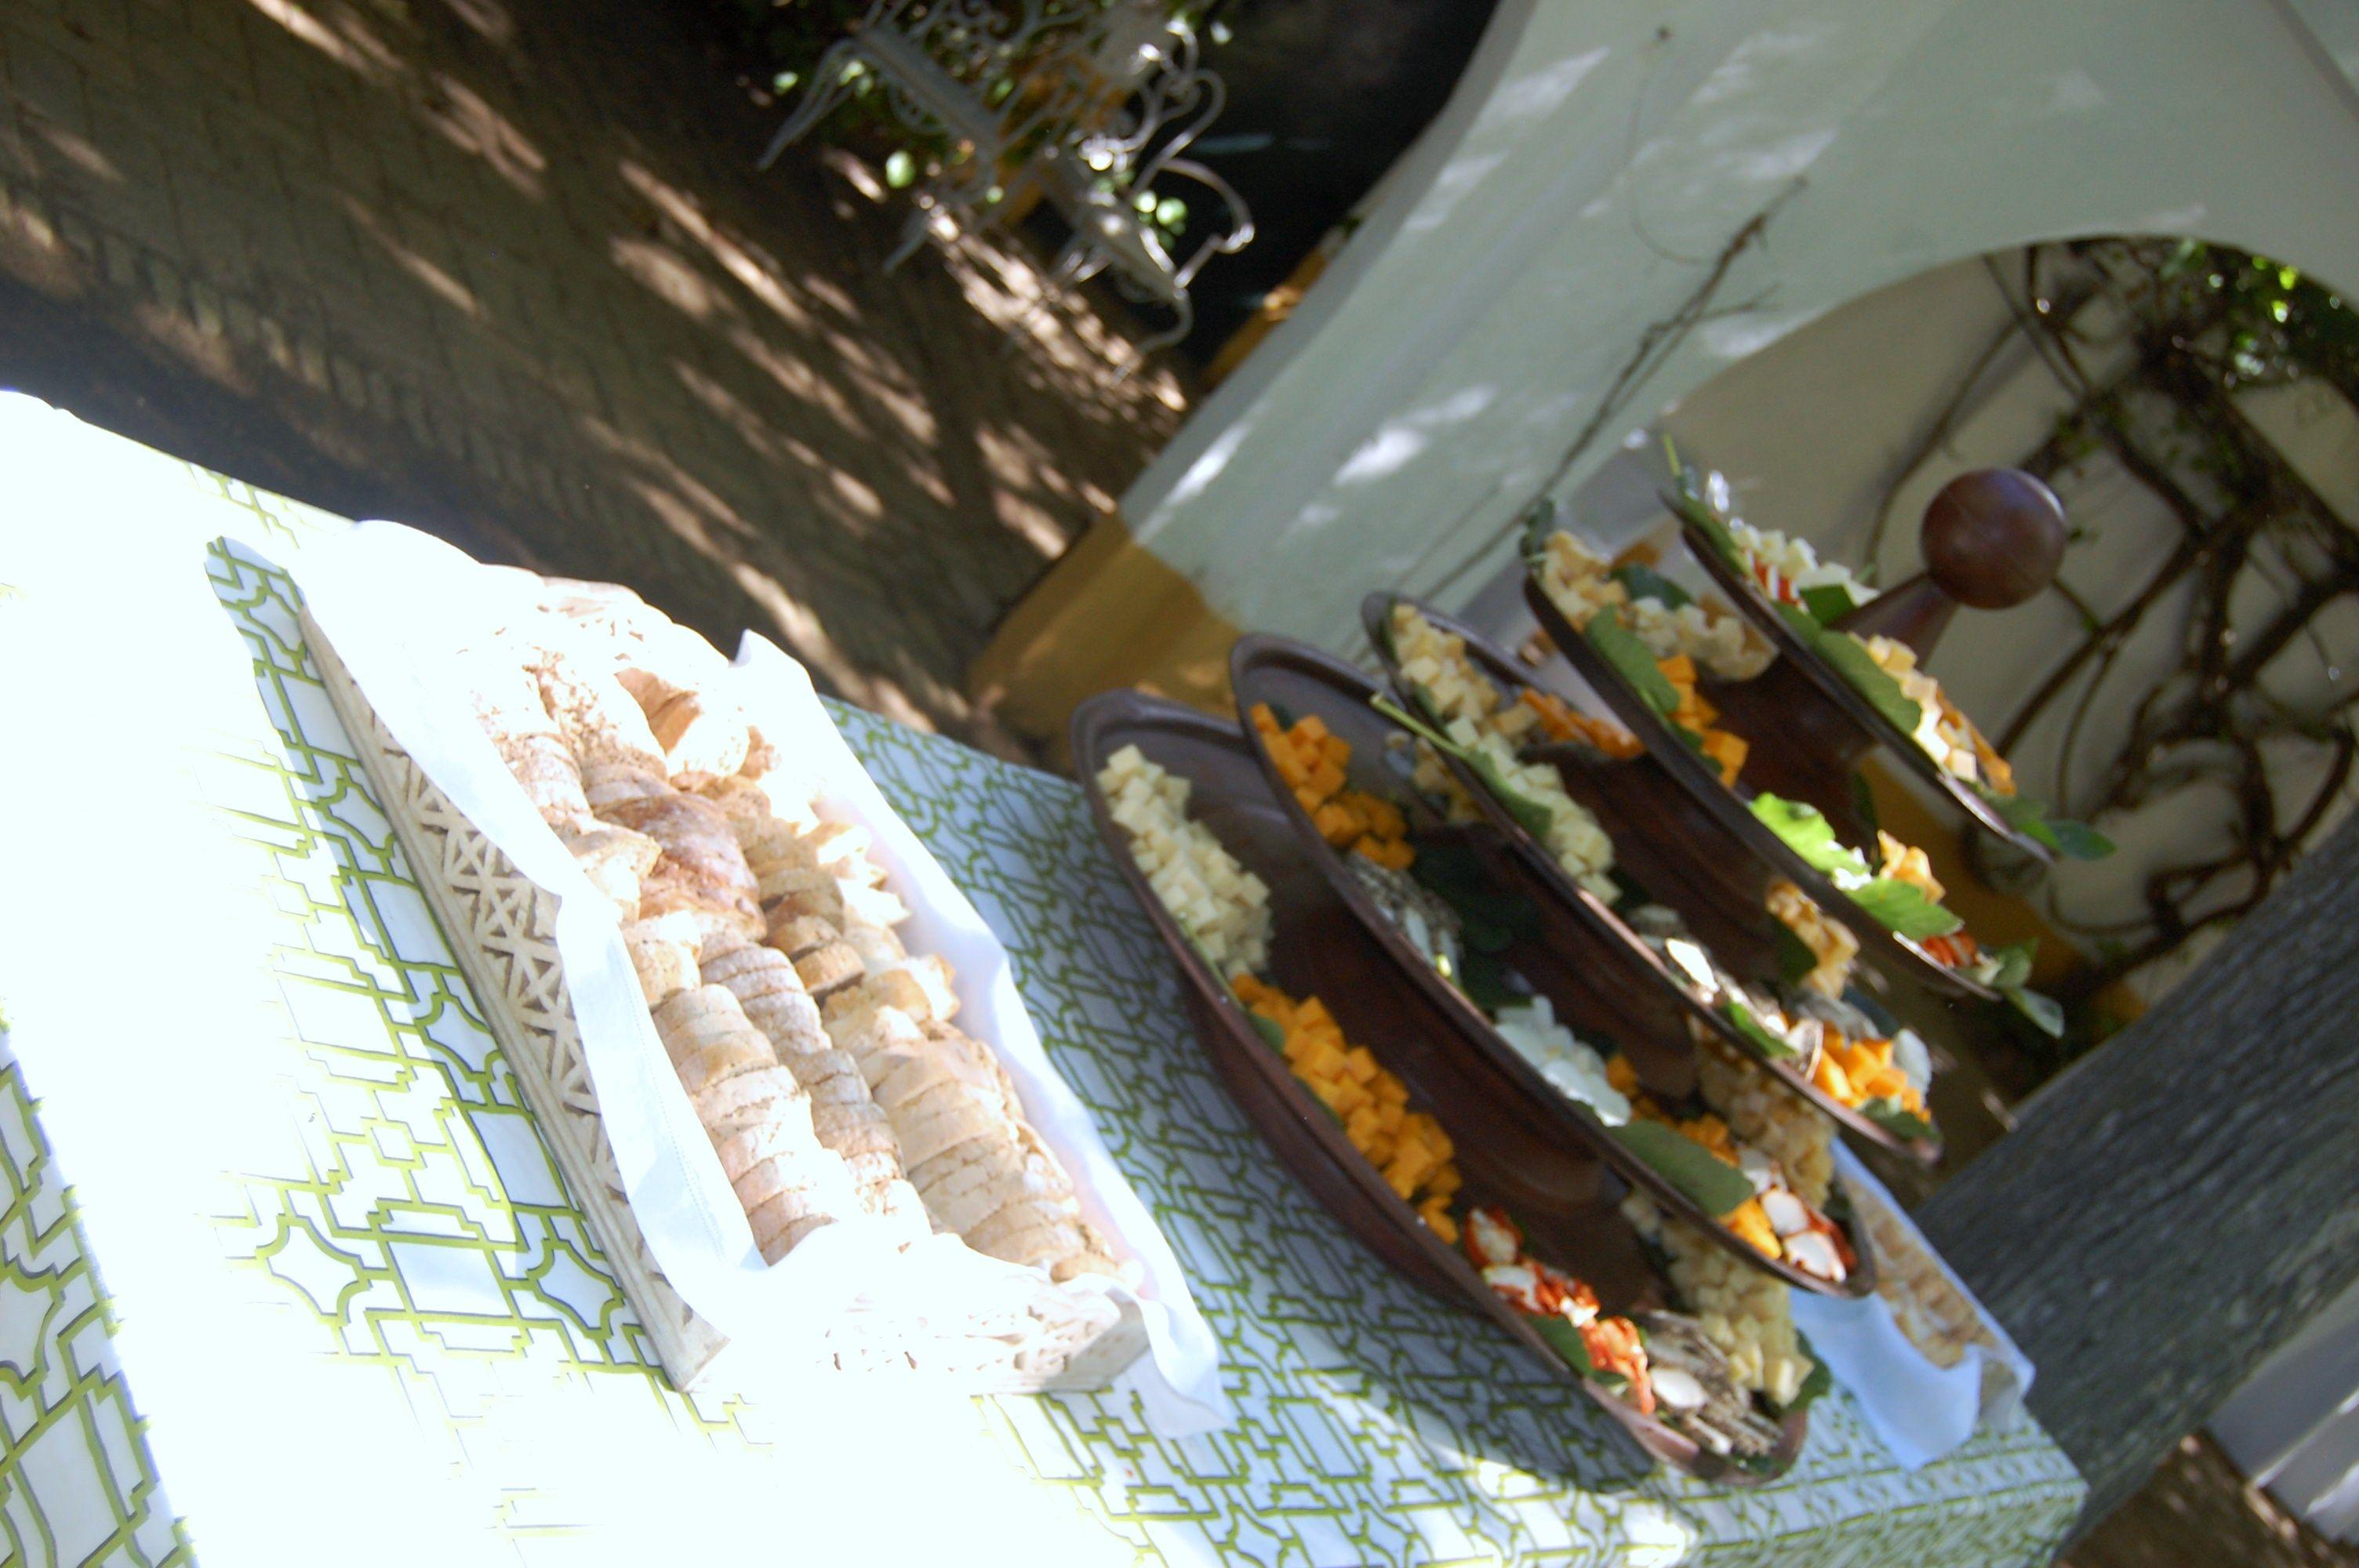 www.laorganizadoradesuenos.com #Buffetdequesos #bodassevilla #eventossevilla #cateringsevilla #cateringaljarafe